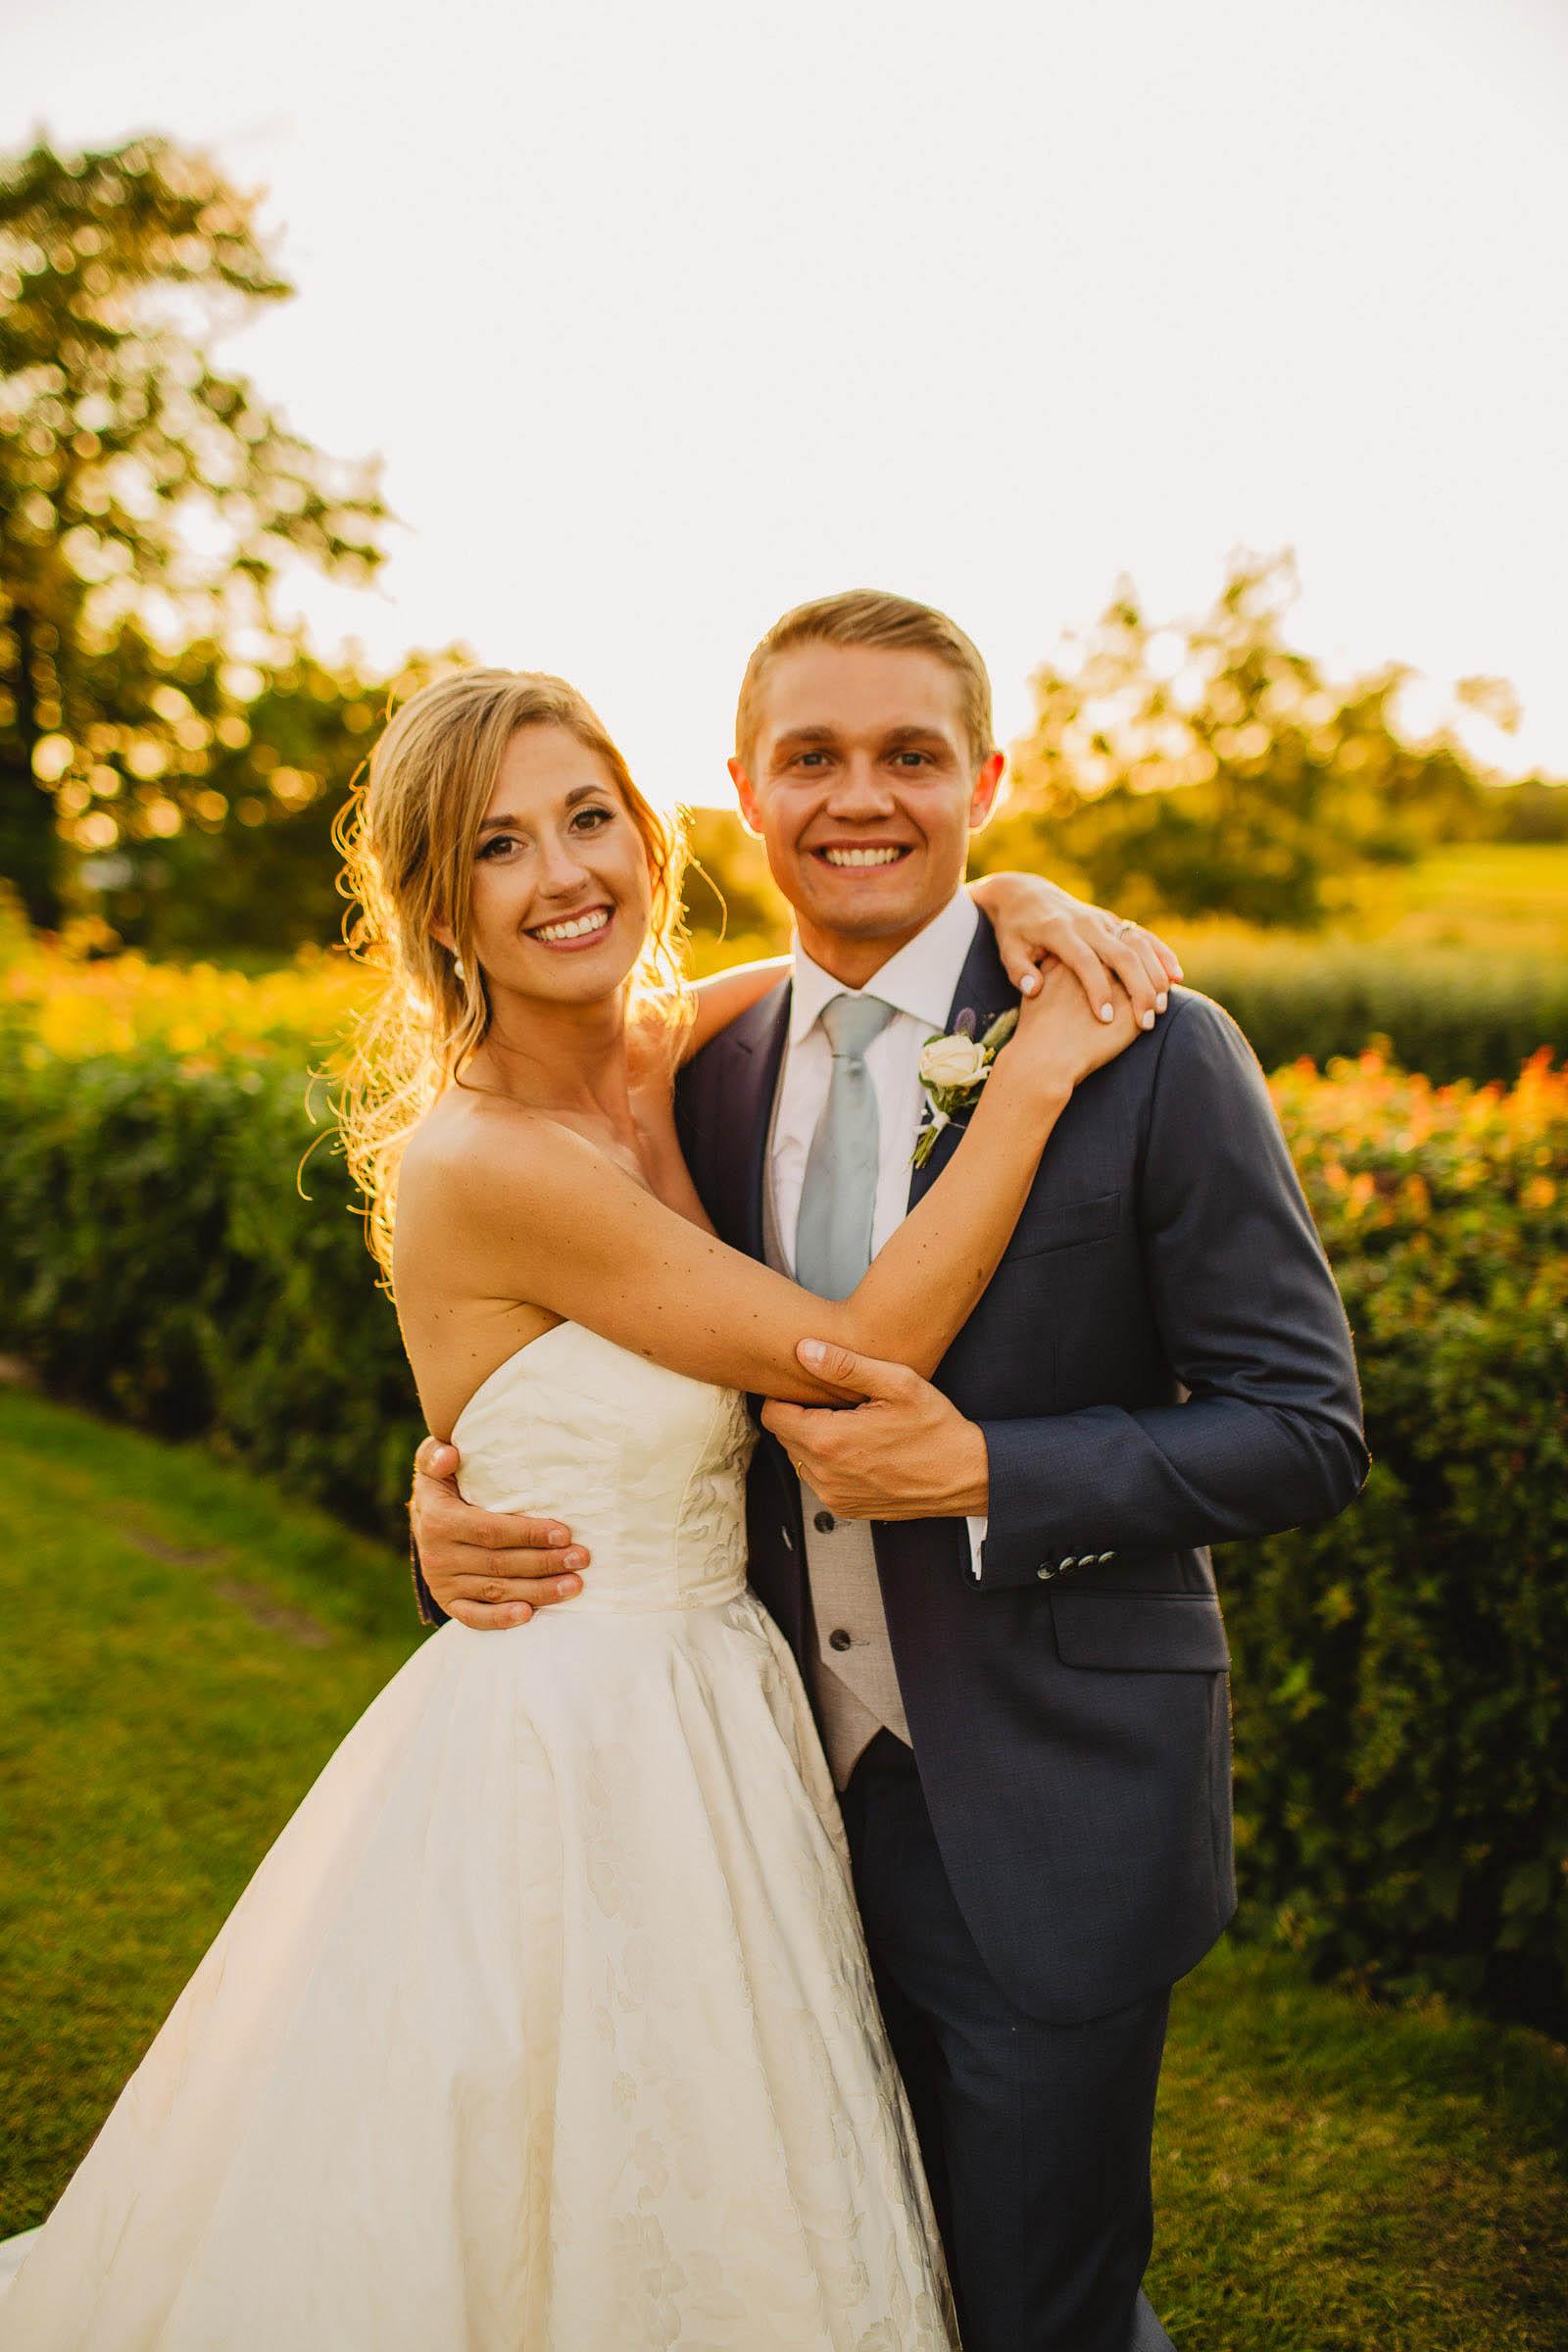 Ross Maddie wedding